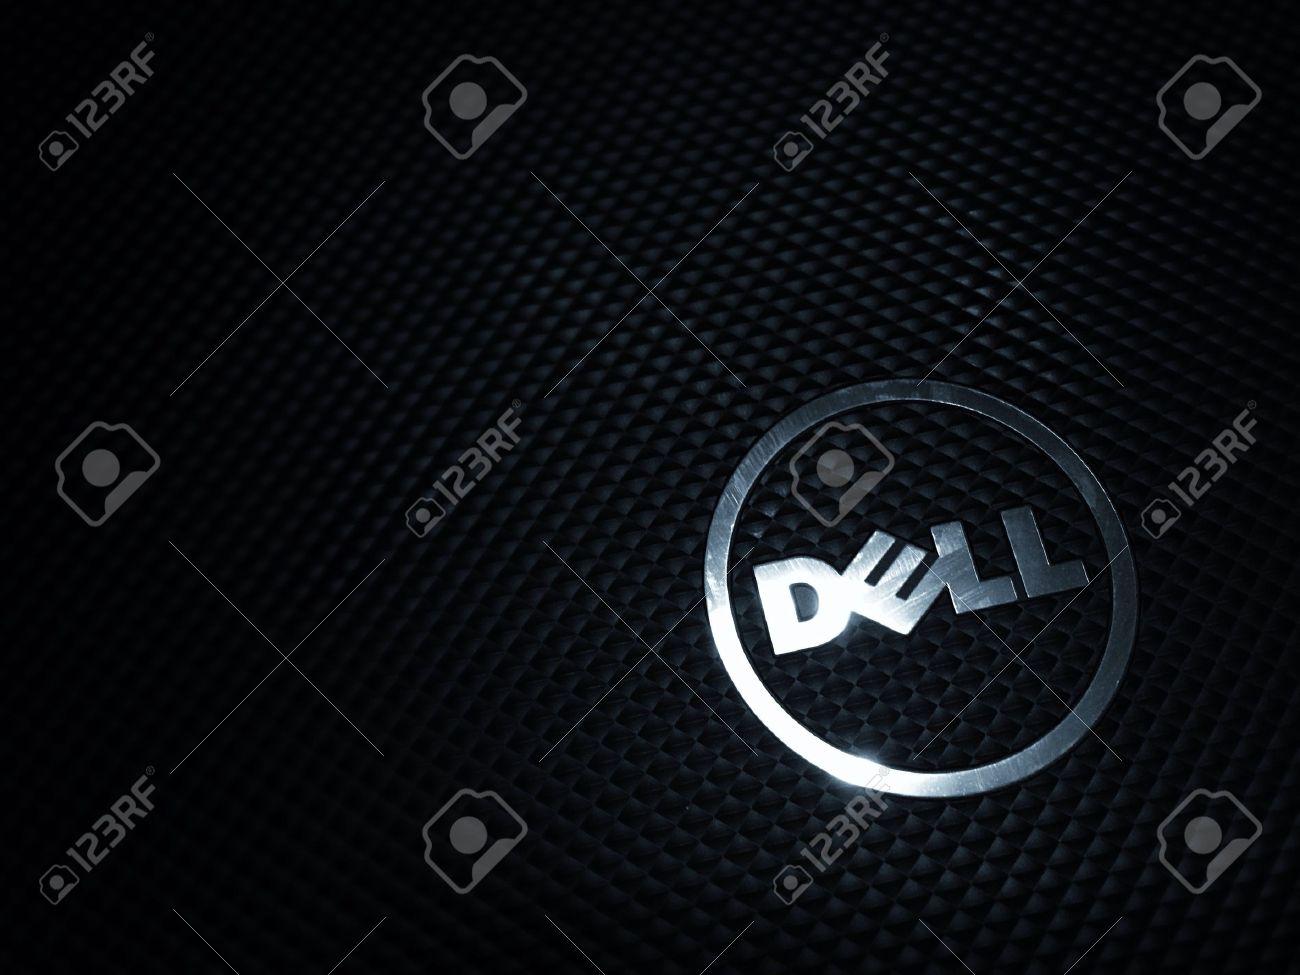 Dell ノート パソコンの壁紙 の写真素材 画像素材 Image